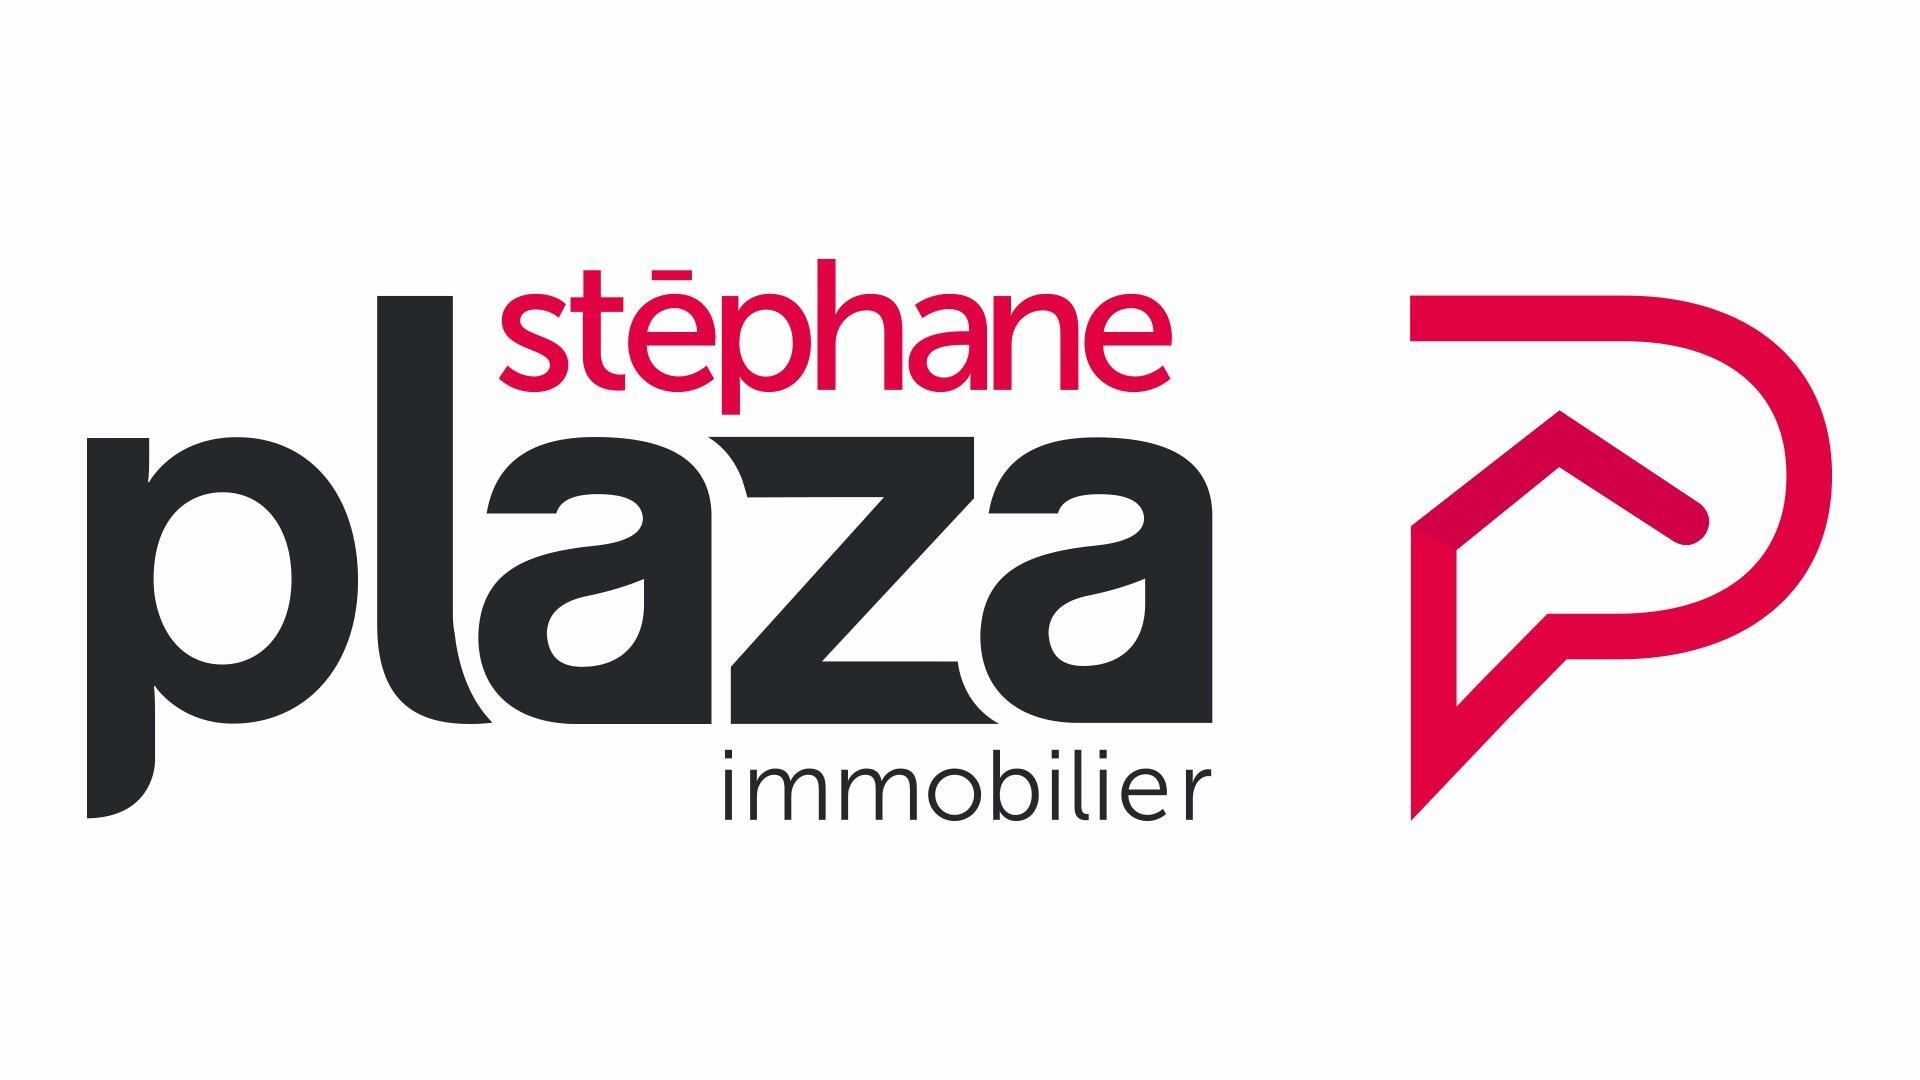 stephane-plaza-immobilier-12466_cli_logo_780cee53591fce2c9eabdbee70ee5374